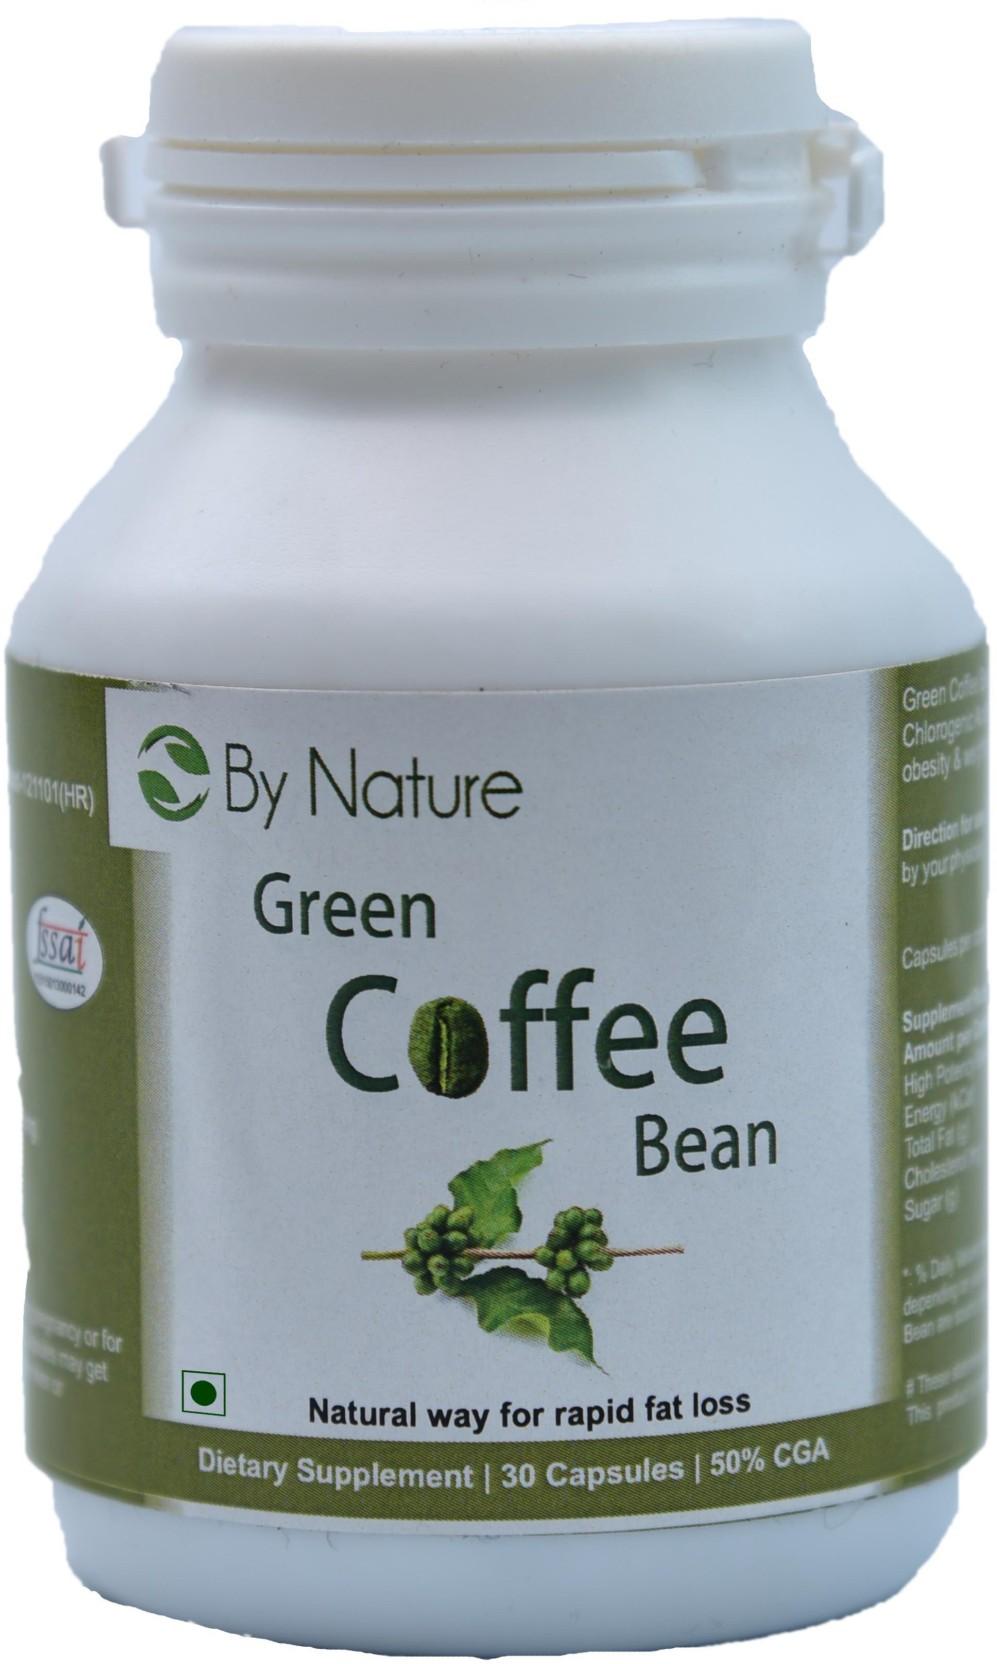 By Nature Green Coffee Bean Capsules Price In India Buy Capsule Pure Arabica Organic 60 Caps 30 No